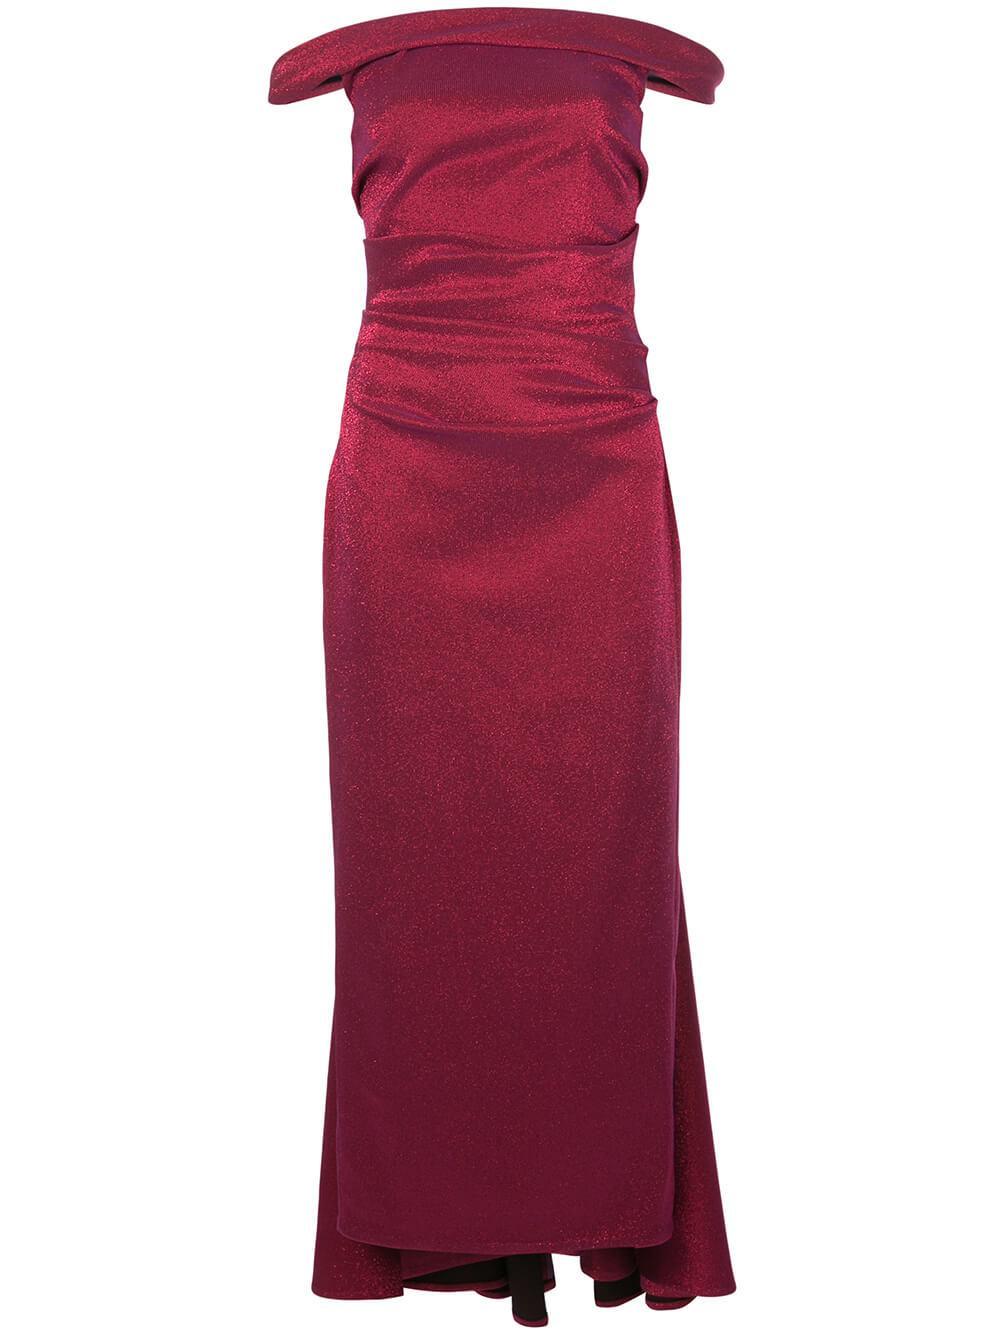 Sleeveless Iridescent Stretch Dress